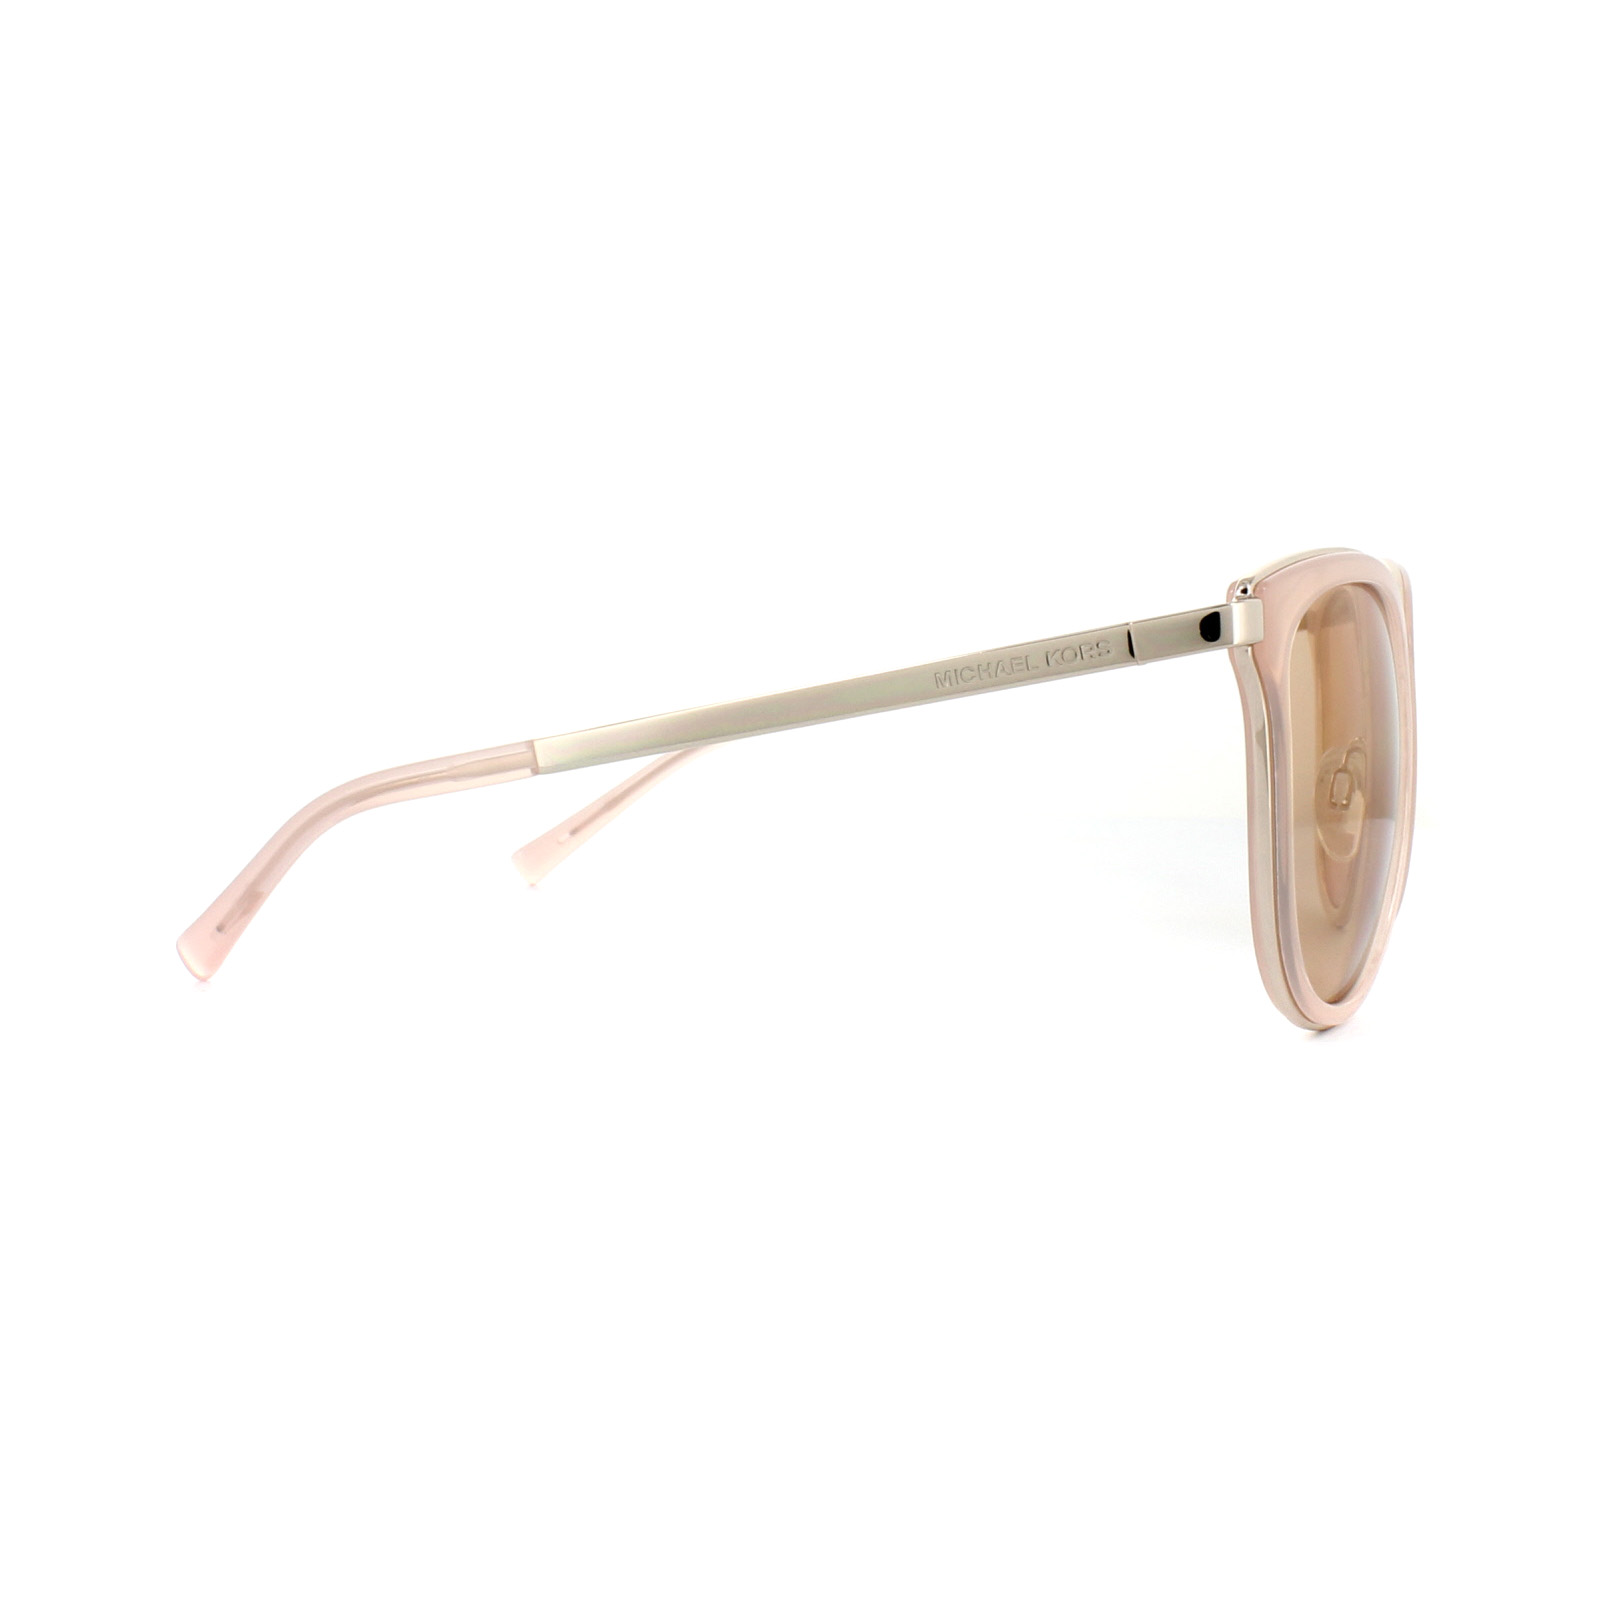 603b36769a Sentinel Thumbnail 4. Sentinel Michael Kors Sunglasses Adrianna 1 1010  1103R1 Pink ...